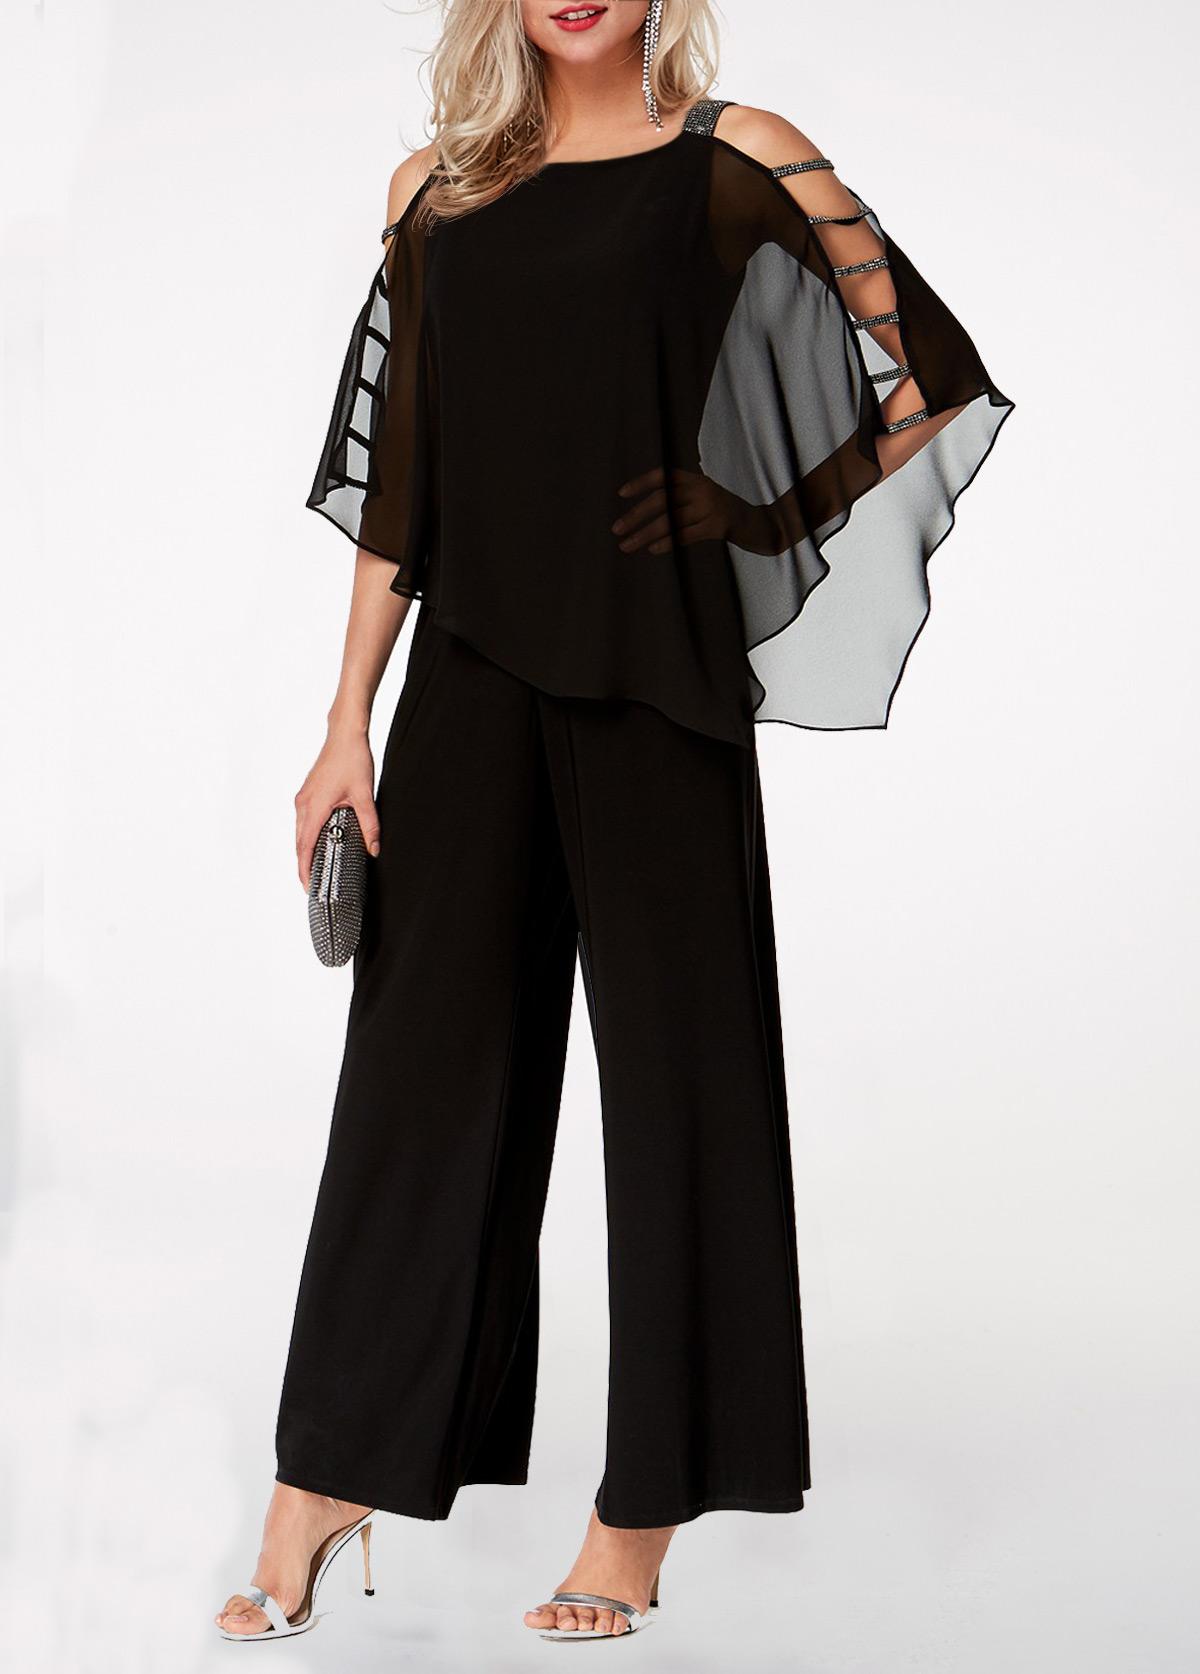 Black Ladder Cutout Sleeve Chiffon Overlay Jumpsuit